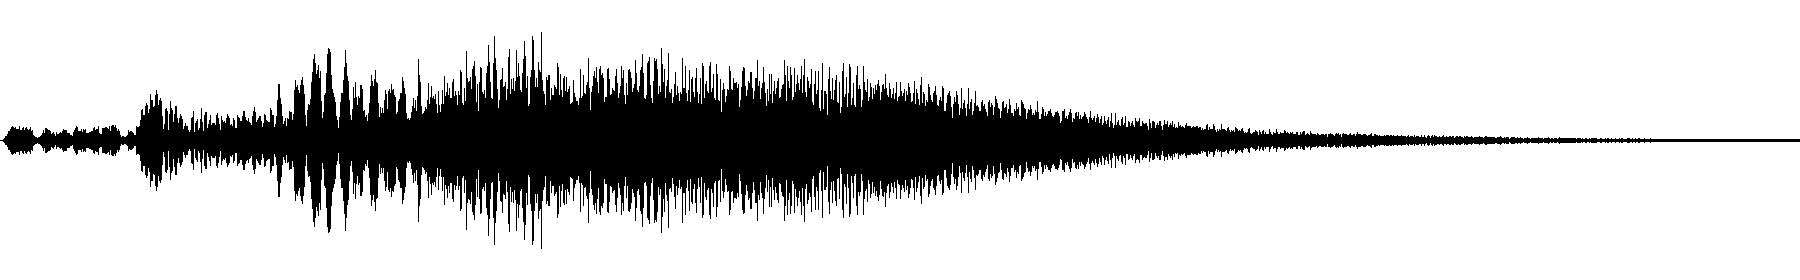 fx 07